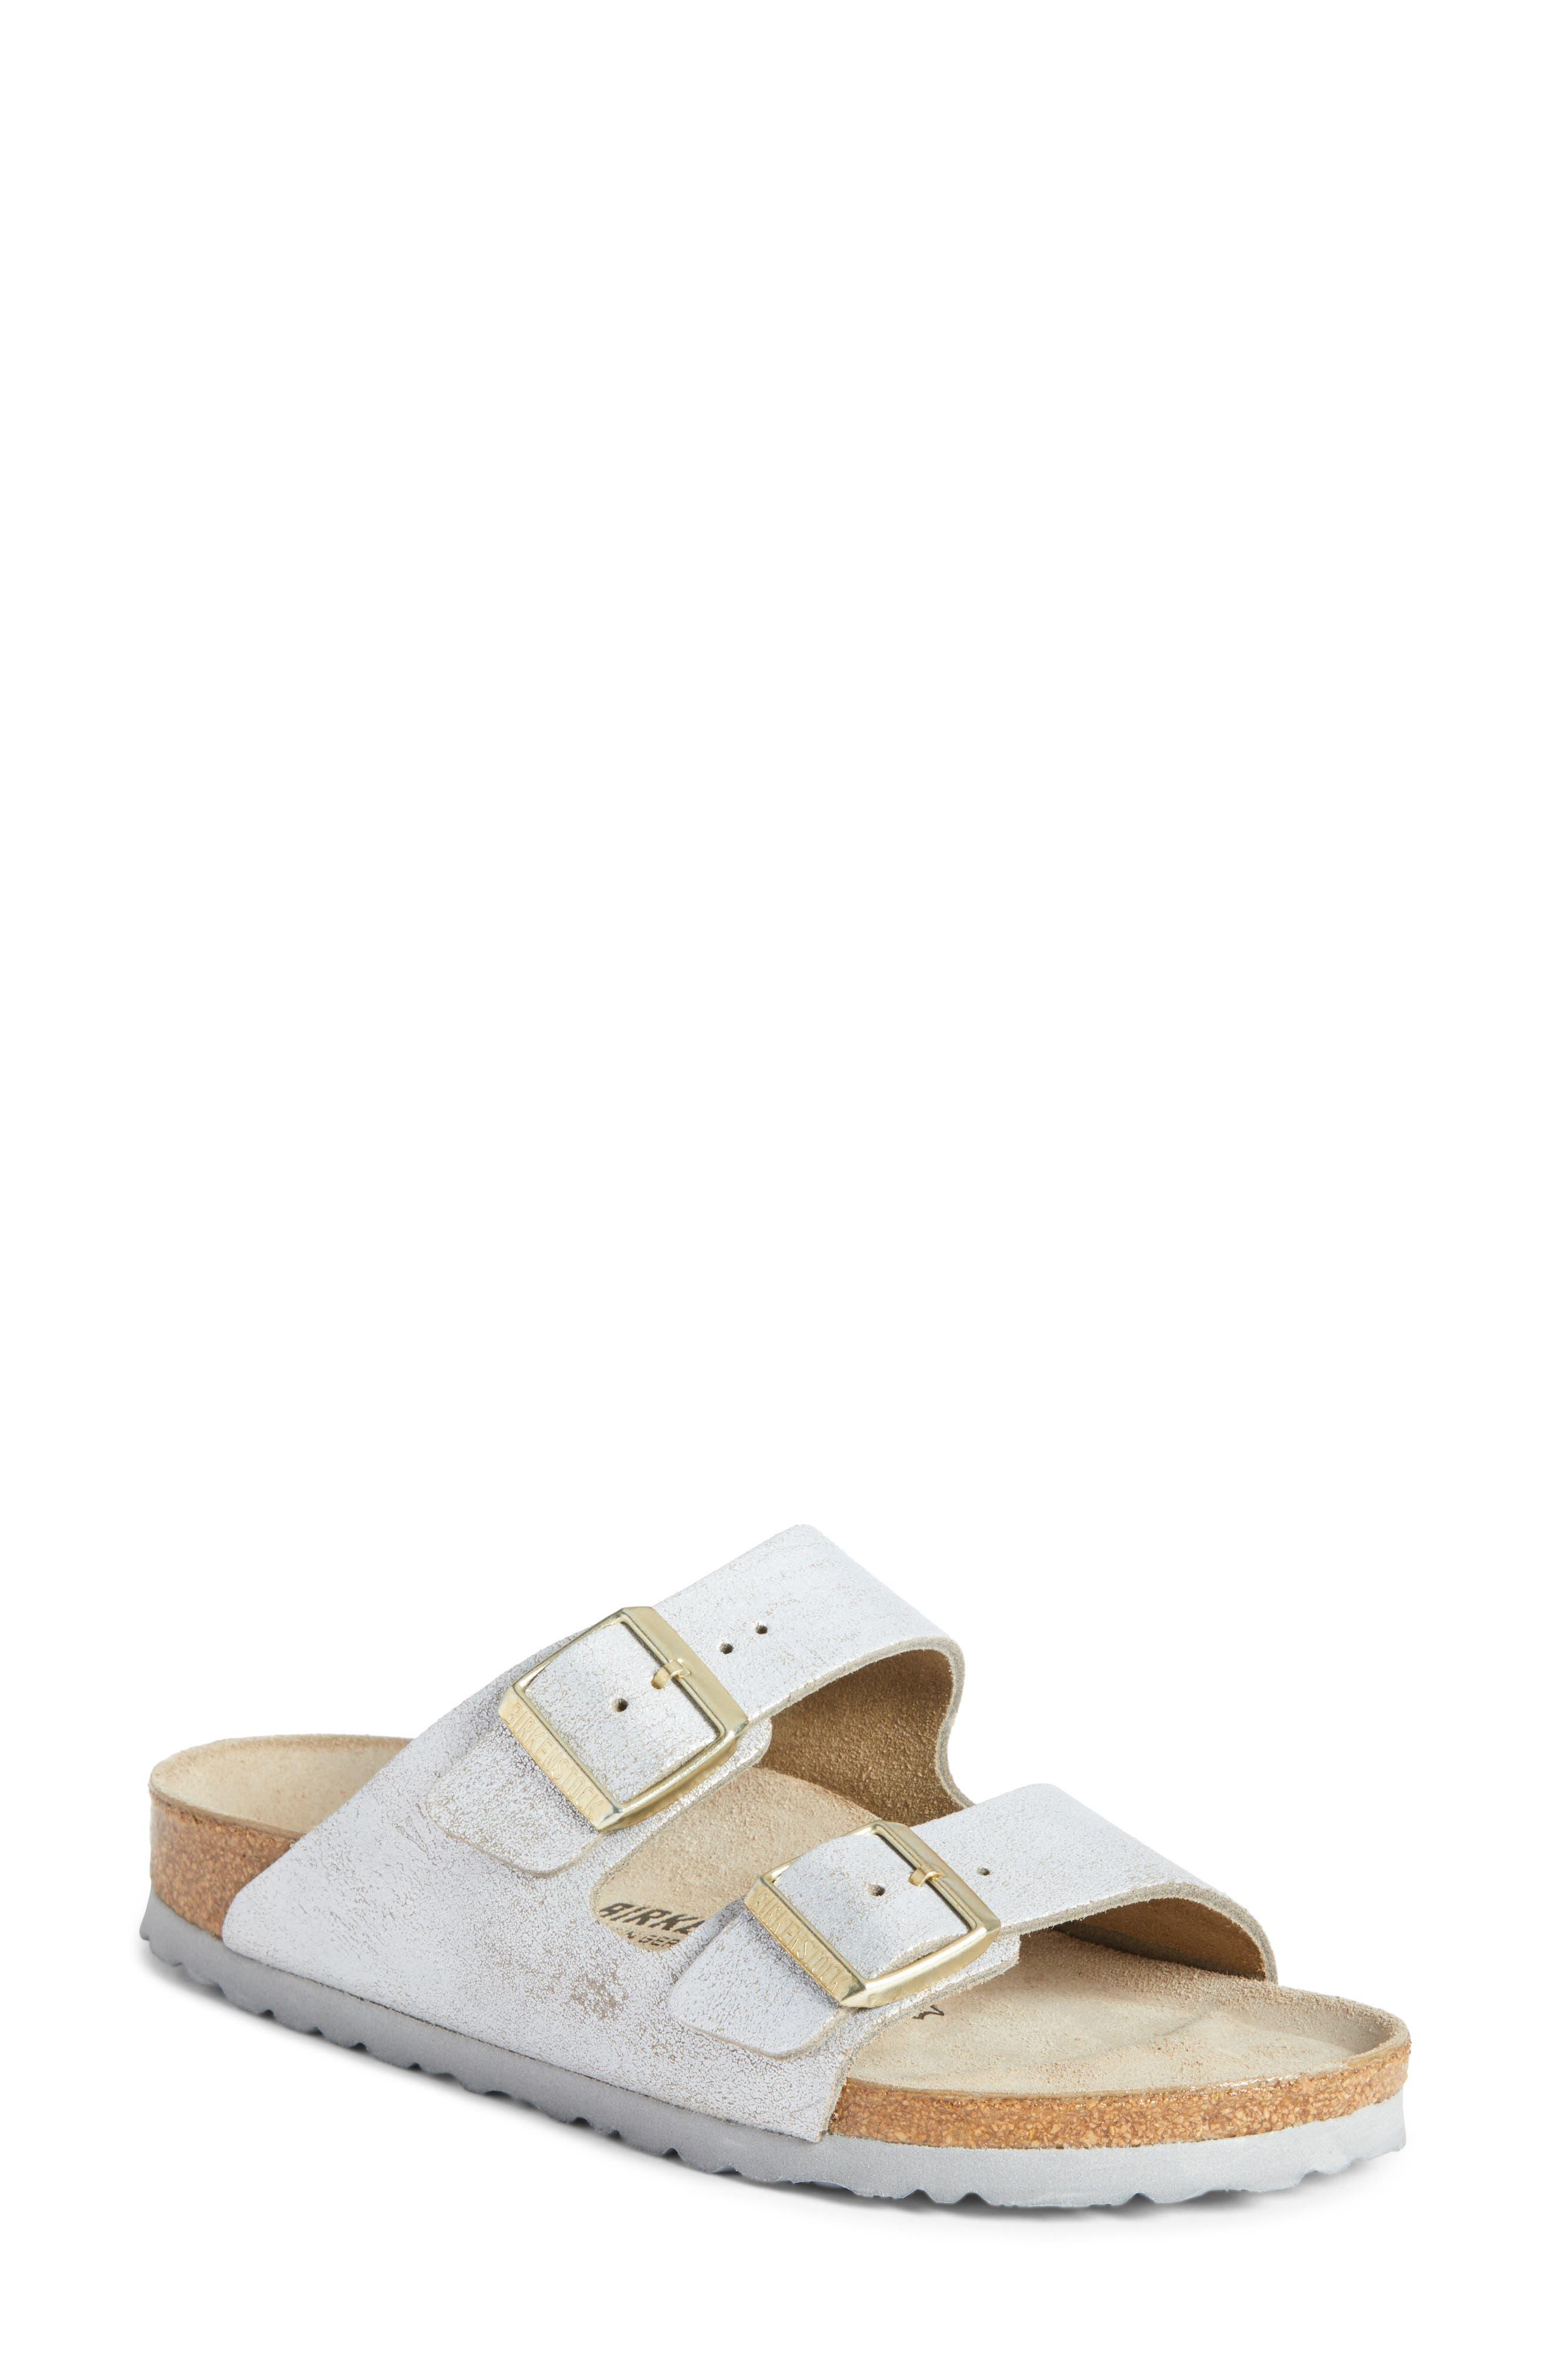 Birkenstock Arizona Soft Footbed Sandal (Women)